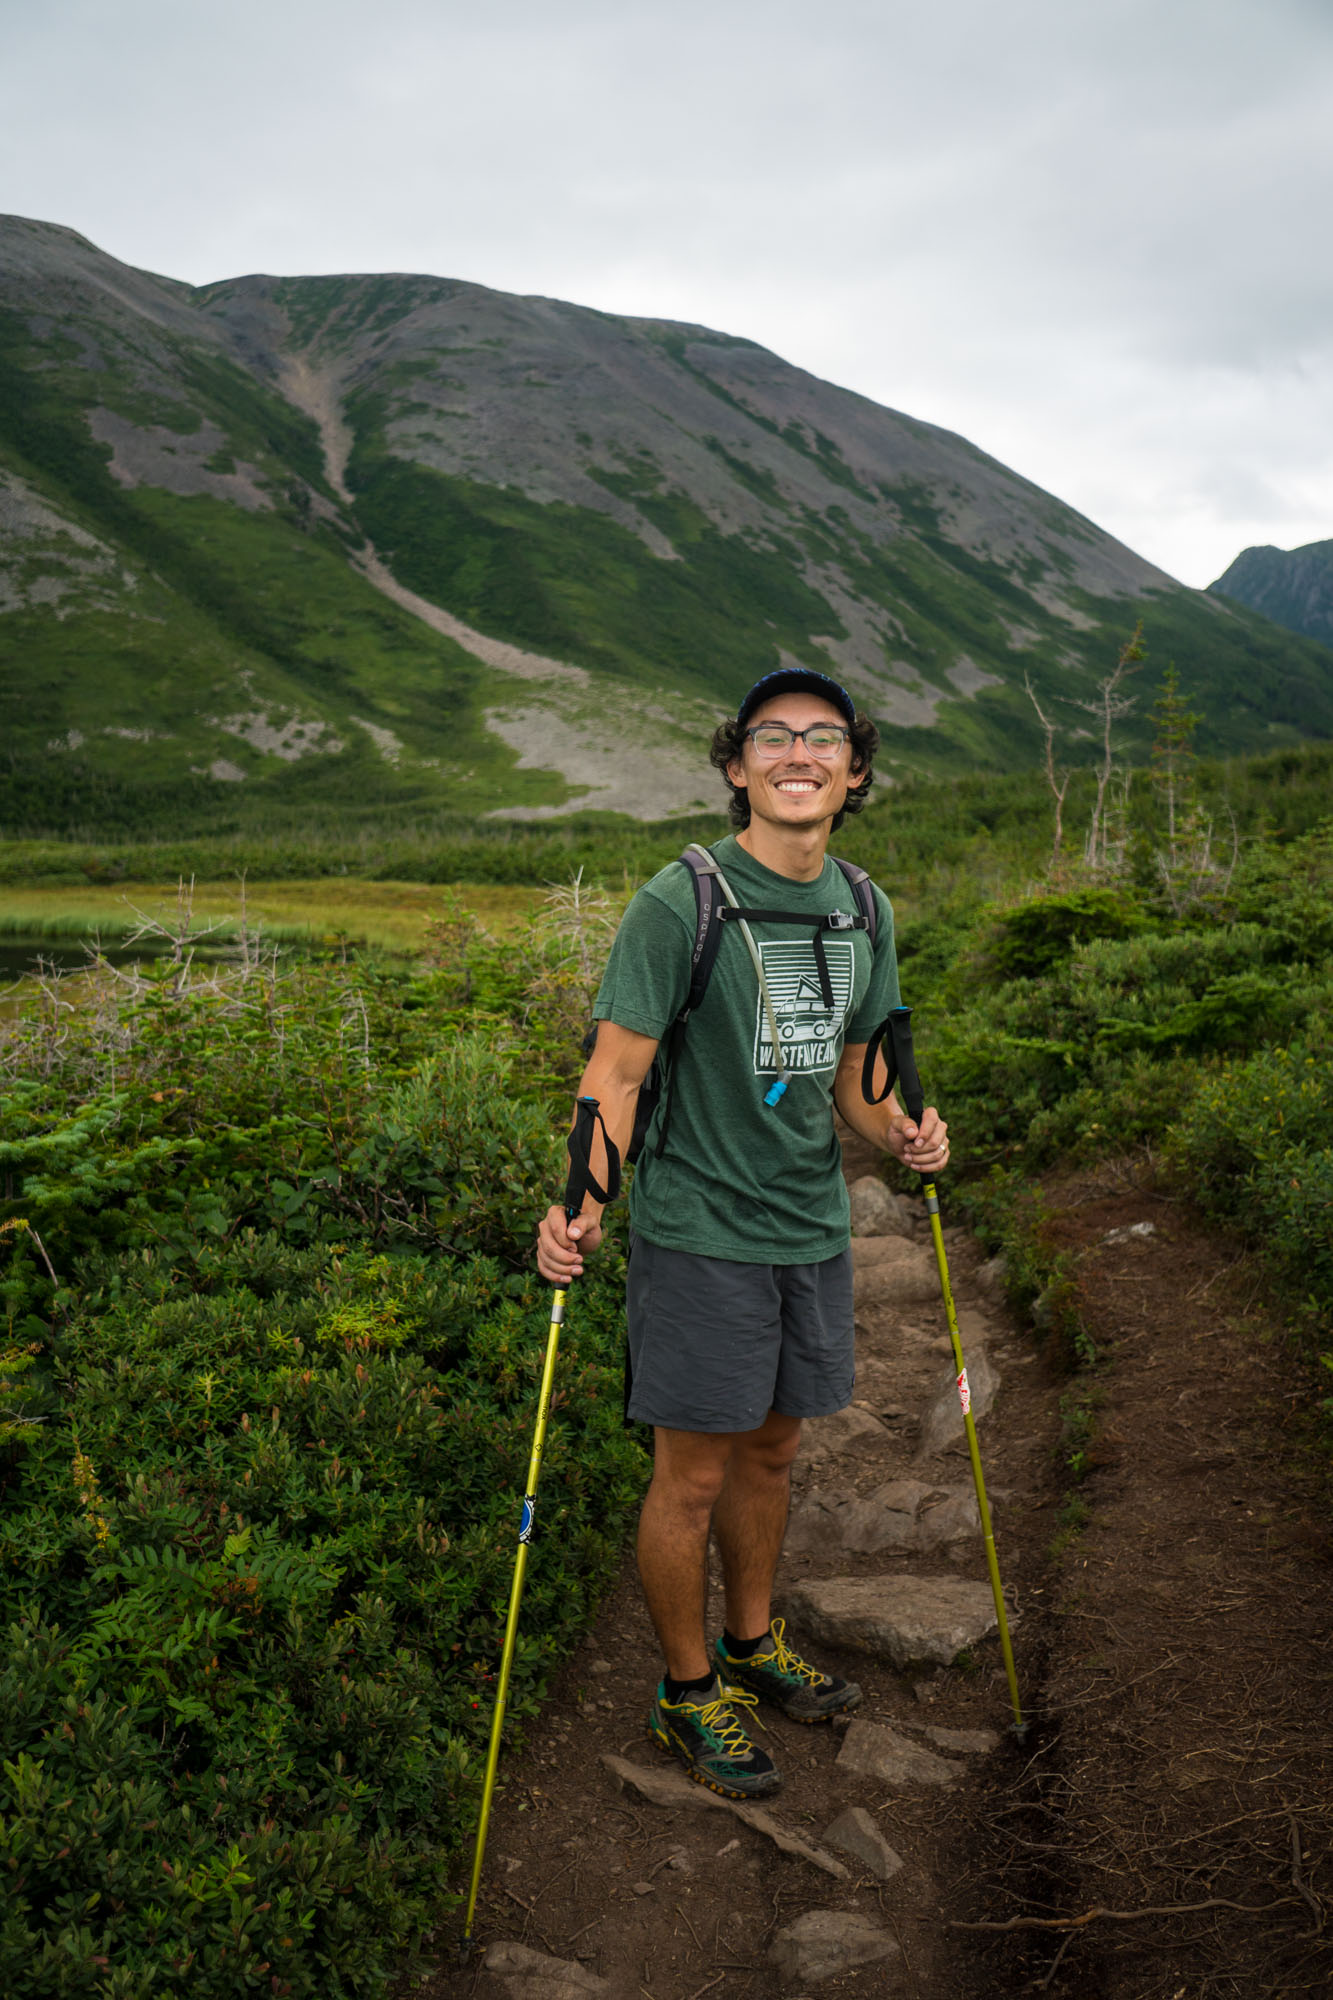 Owen starting the hike up Gros Morne